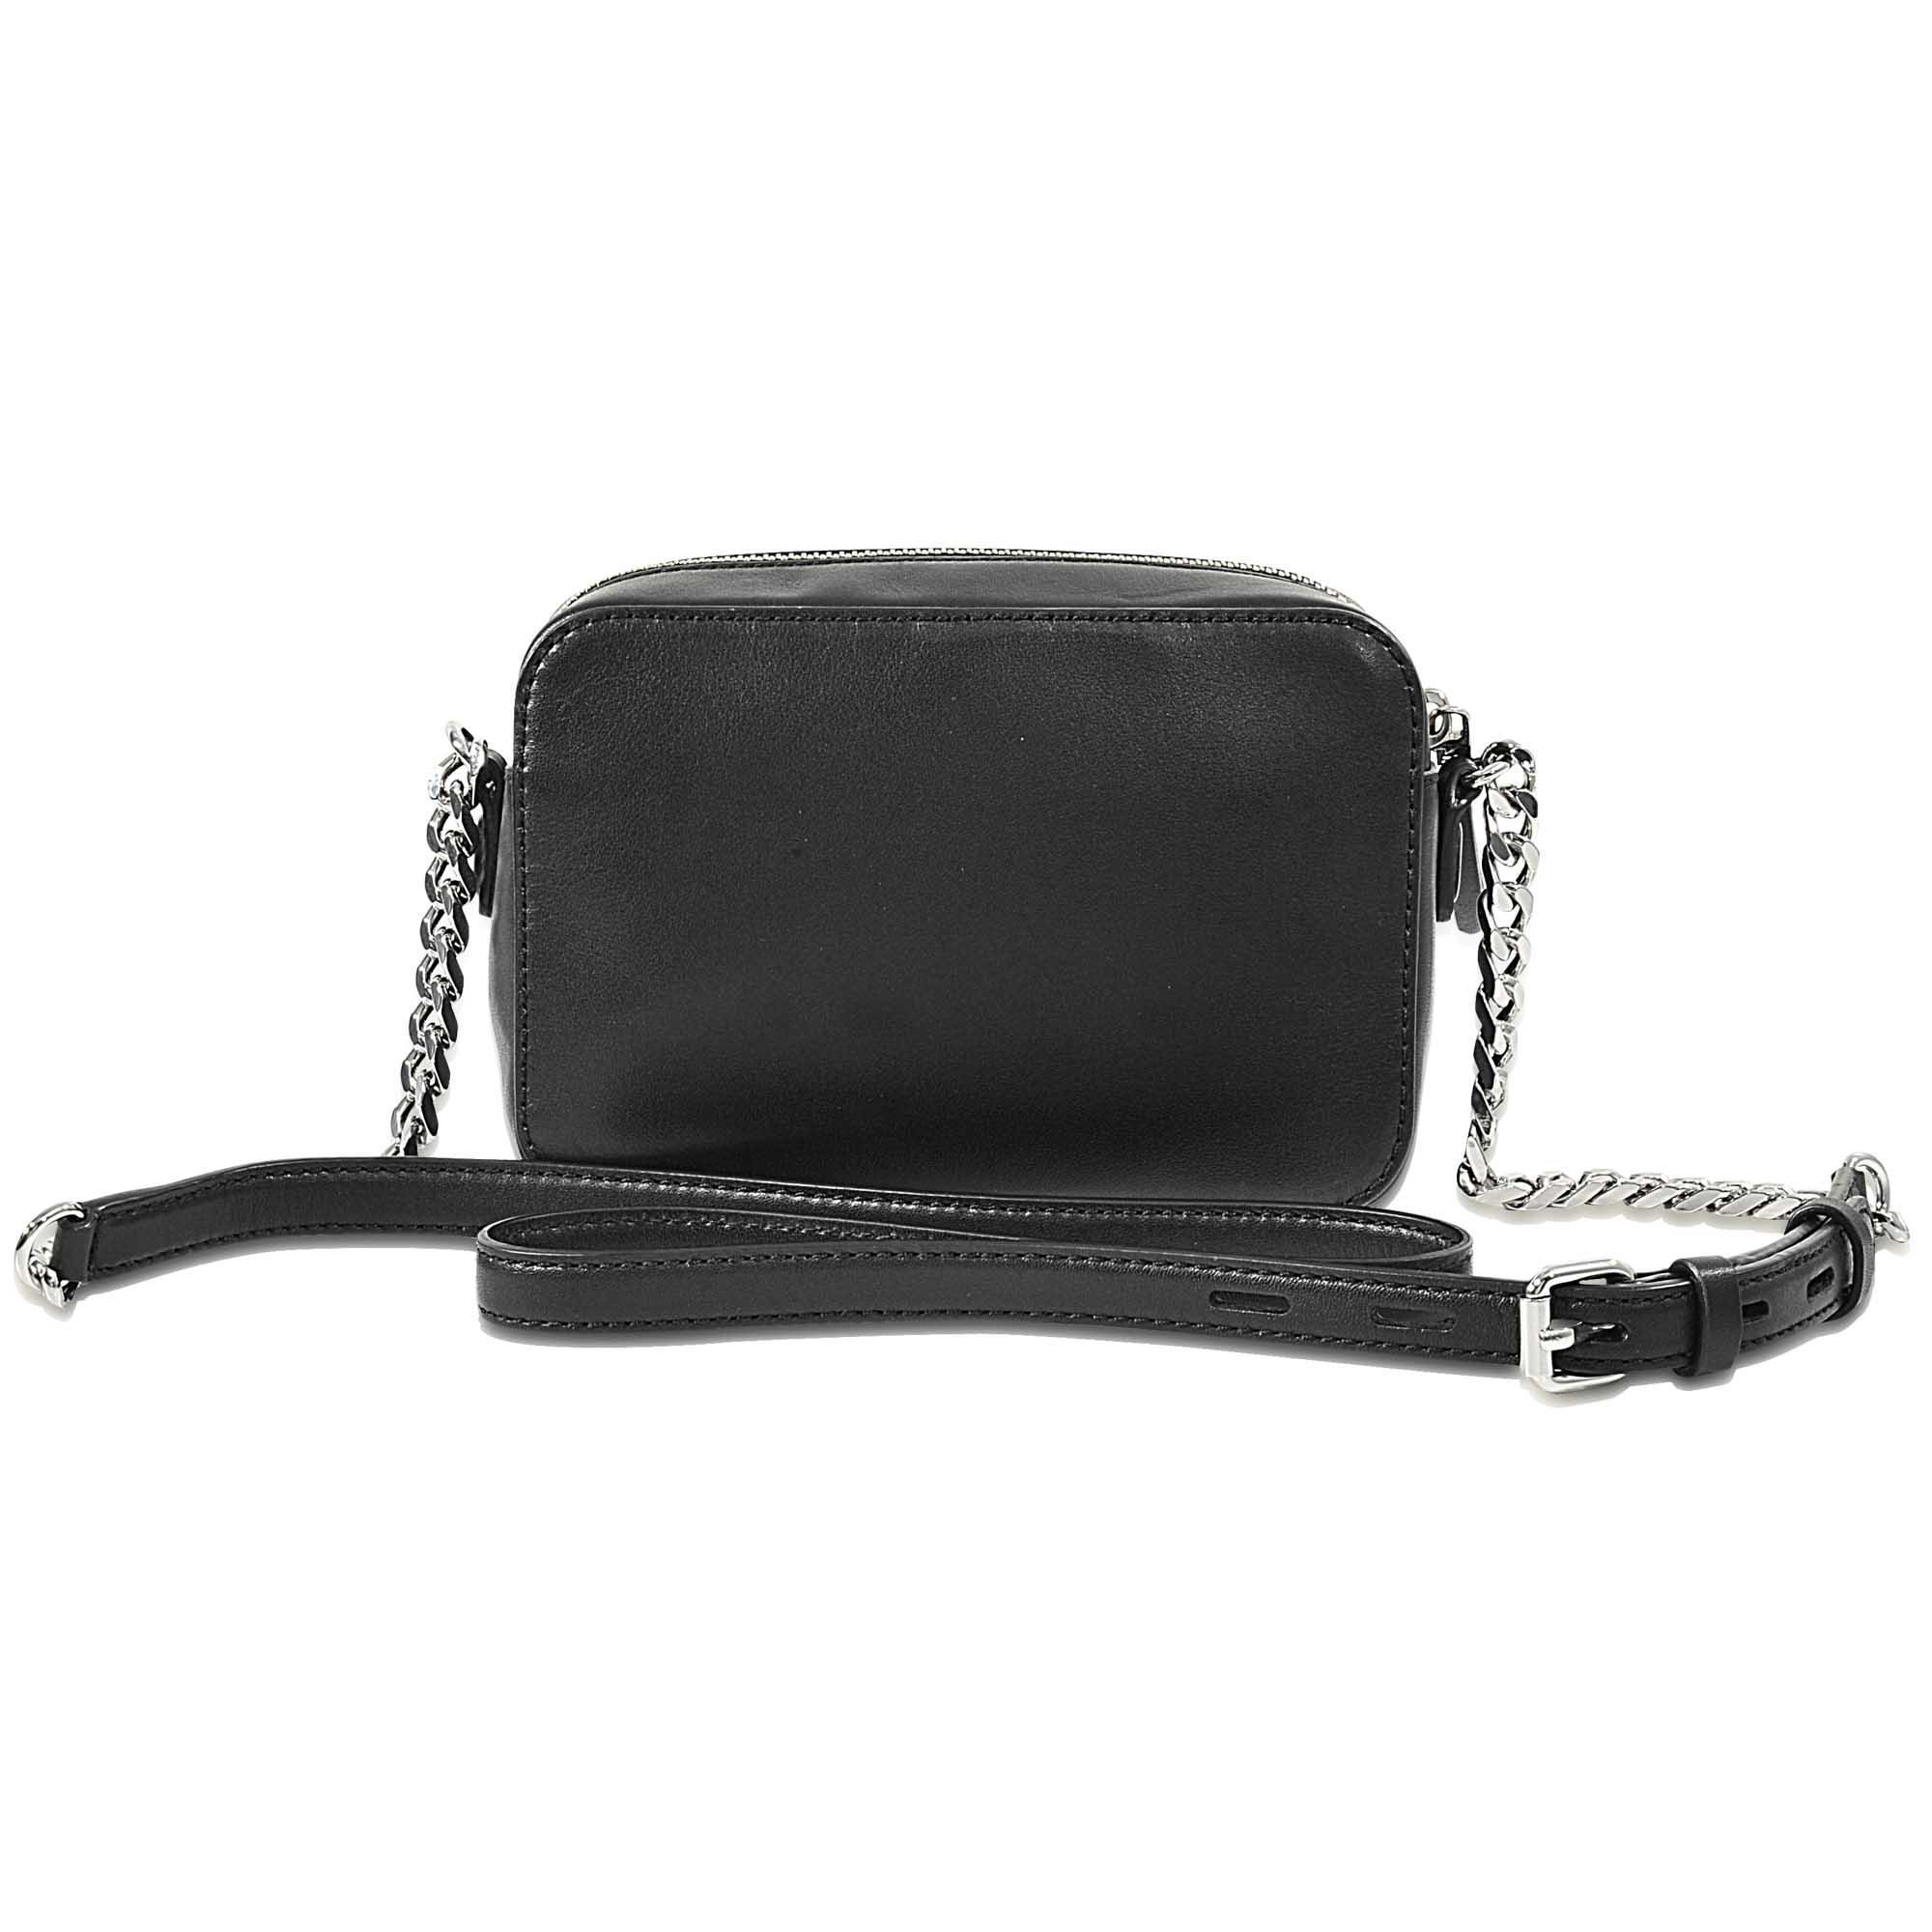 Karl Lagerfeld Leather K Rocky Studs Small Crossbody Bag